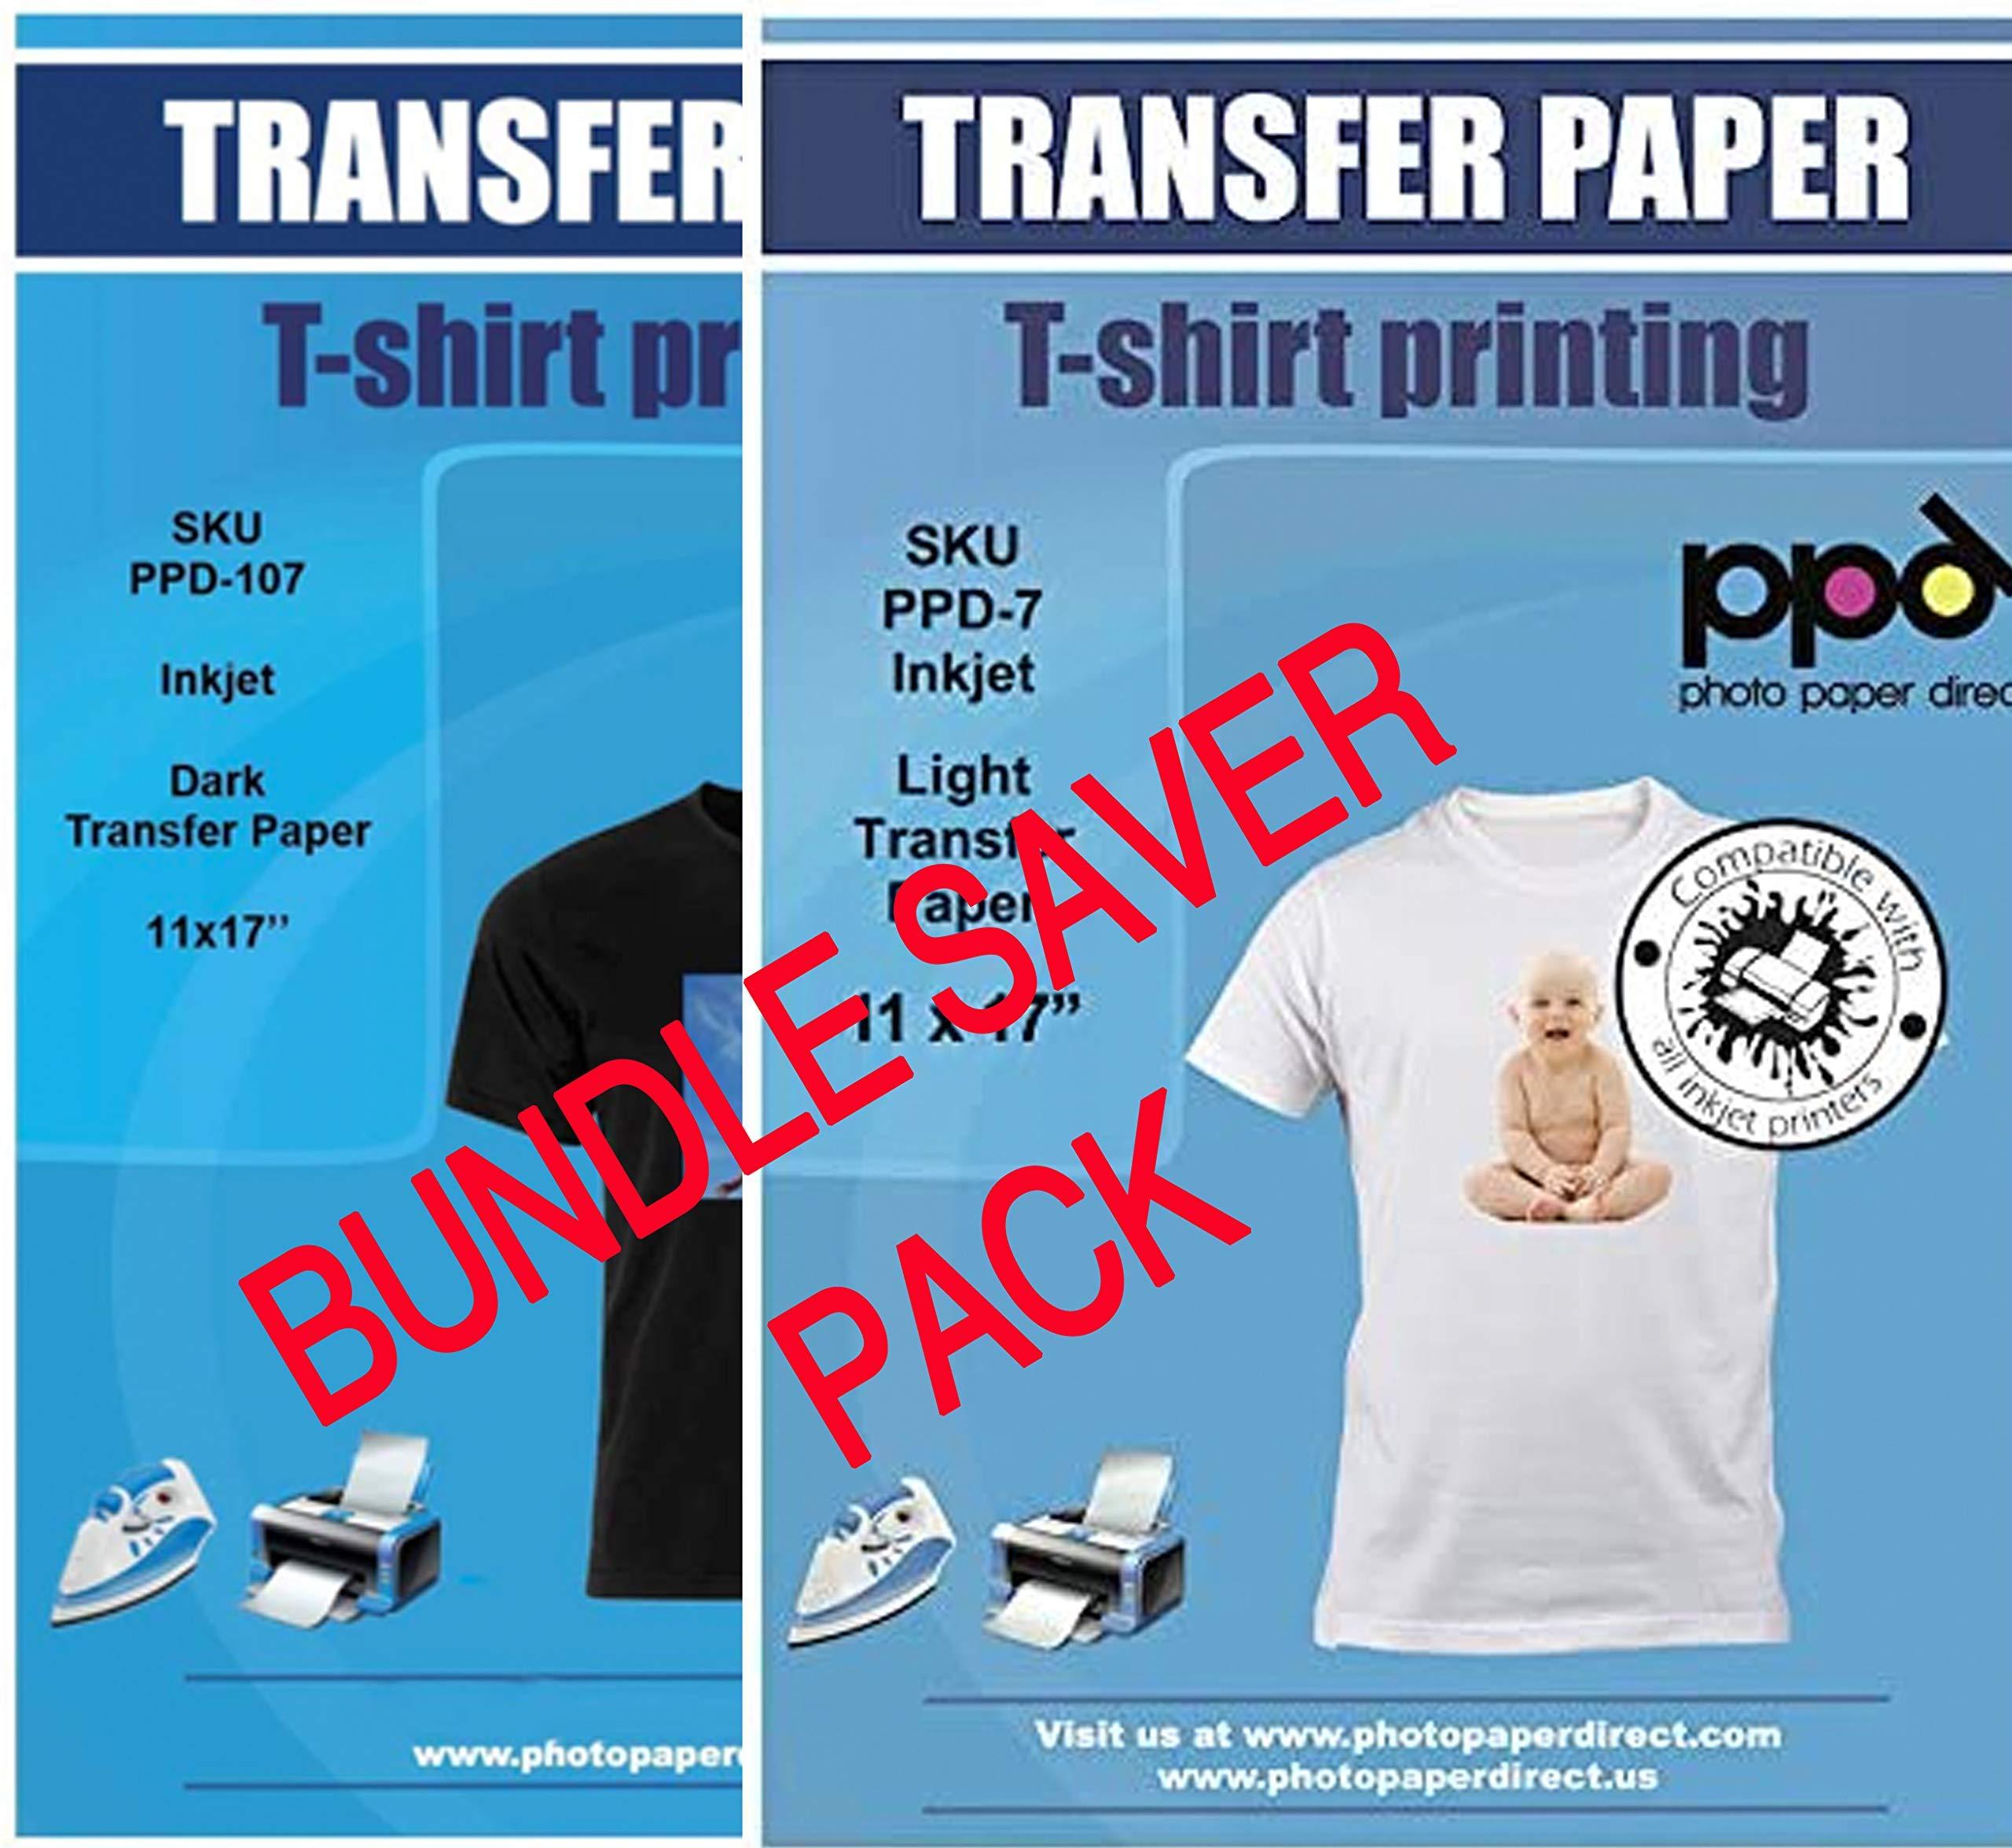 "PPD Inkjet Iron-On Bundle of T Shirt Transfer Paper 11x17"" of Light x10 Sheets + Dark x 10 Sheets"